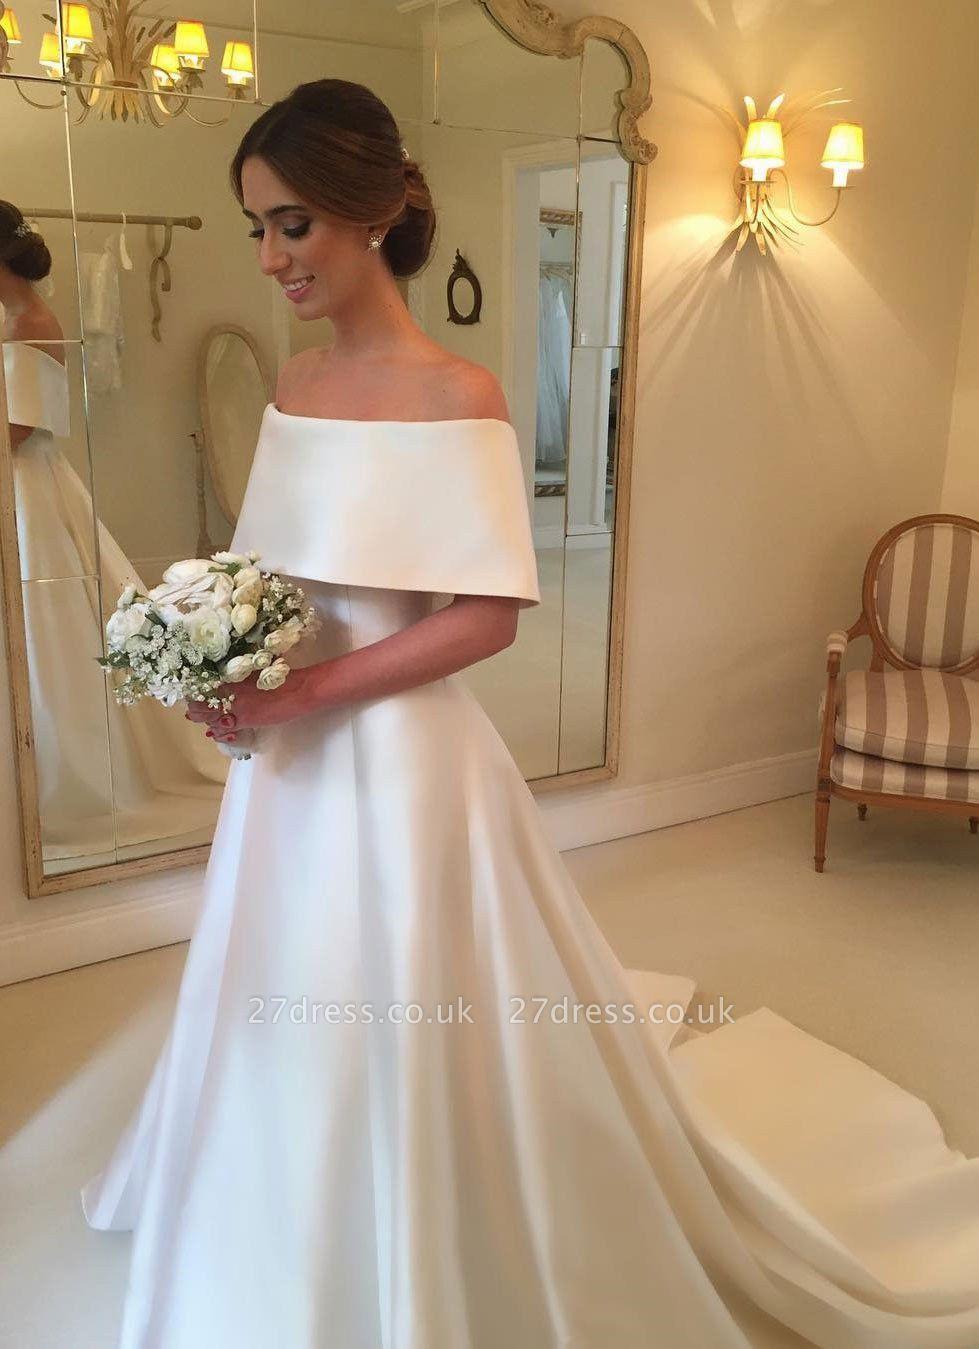 Simple White Off-the-shoulder A-line Wedding Dress | Elegant Bridal Gown